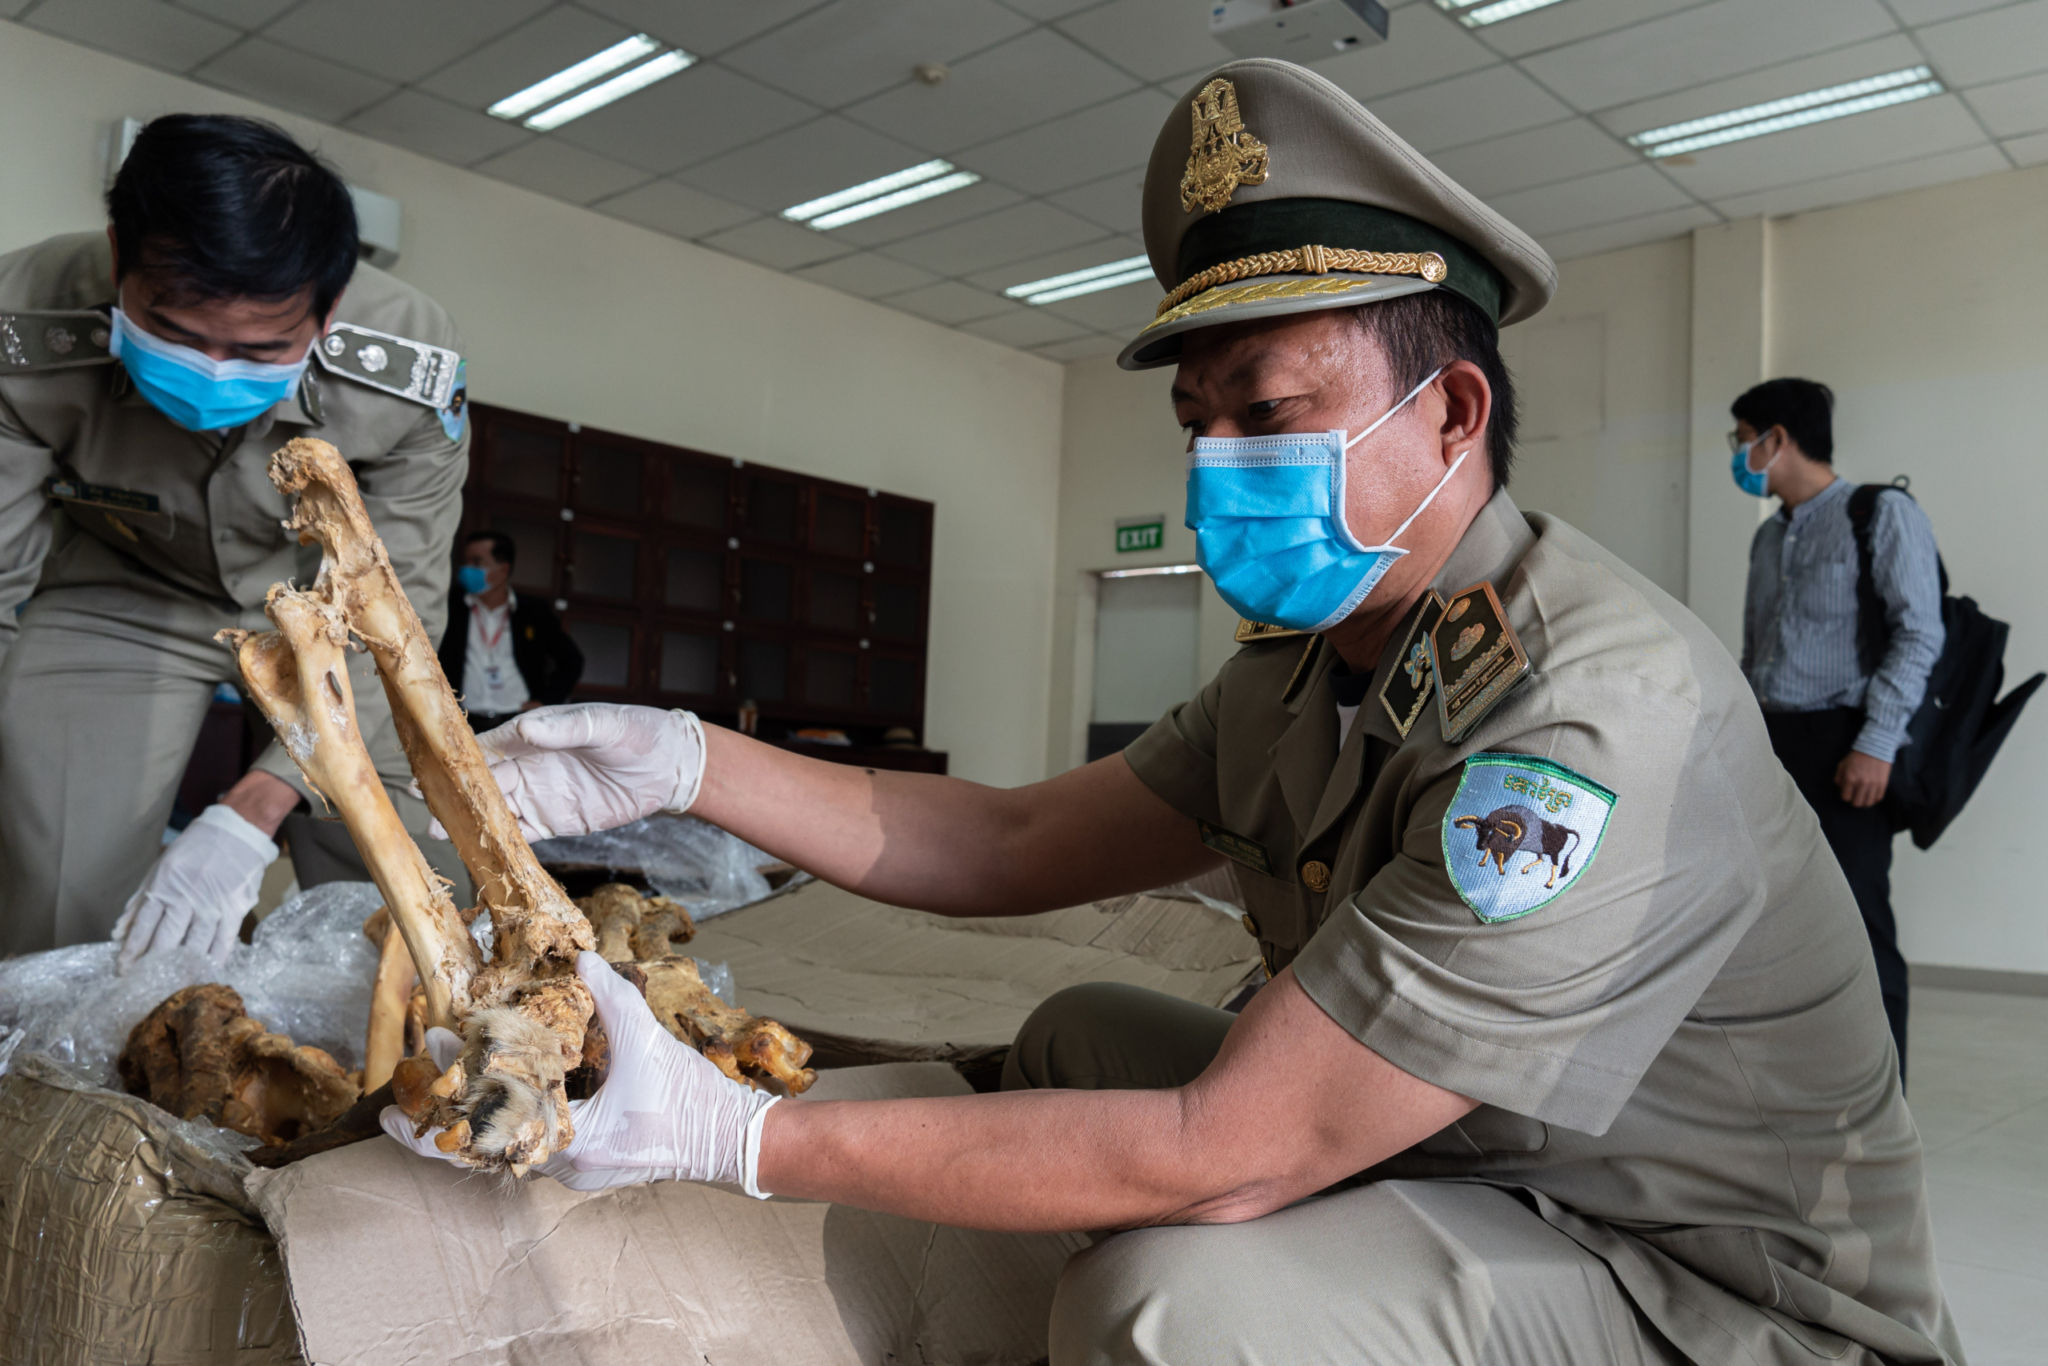 Major shipment of suspected lion bones opened